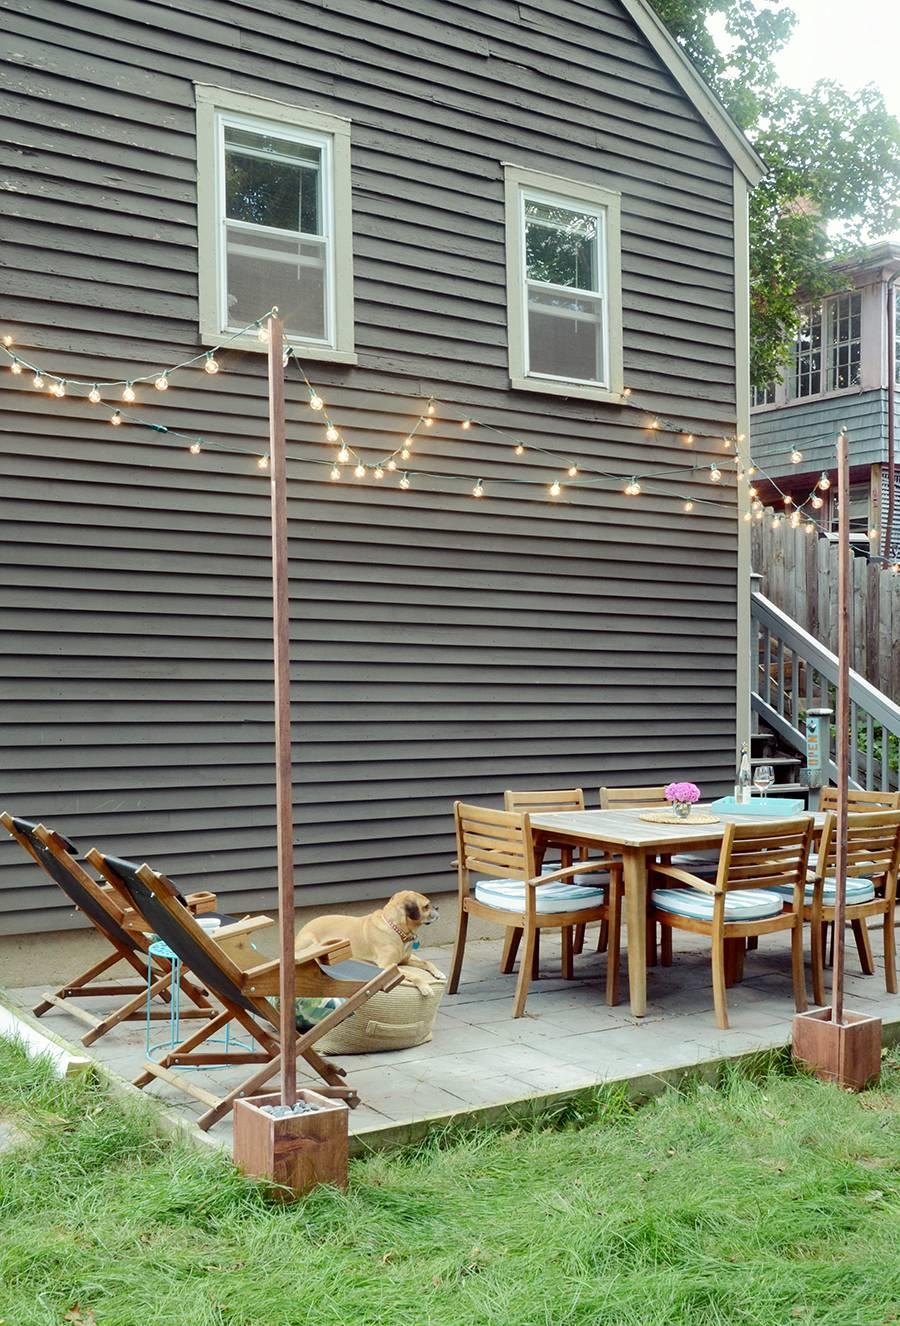 Outdoor Patio Lighting Ideas Australia: DIY Outdoor Bistro Light Stands For Your Patio